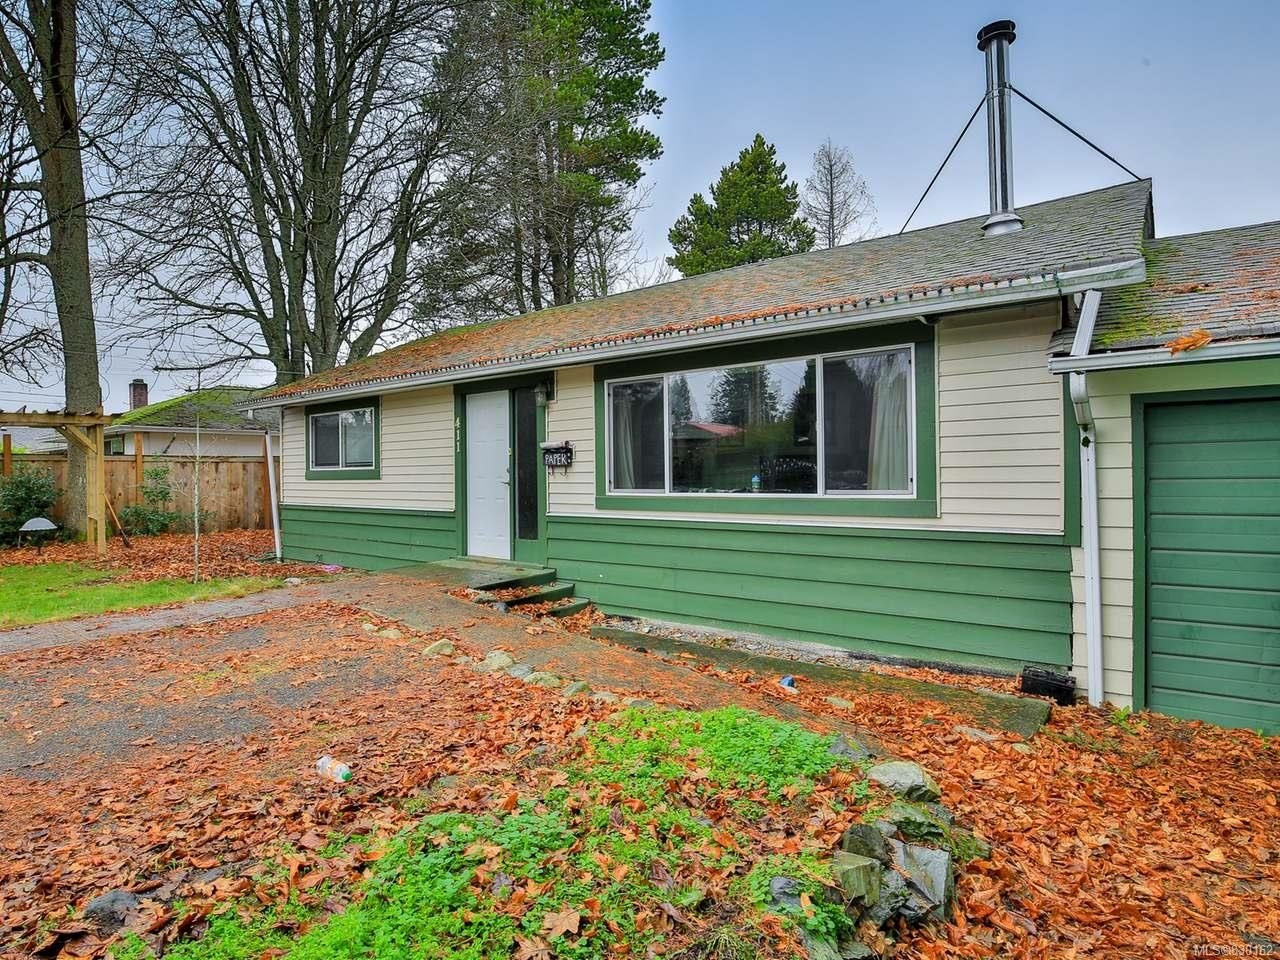 Main Photo: 411 Oak Ave in PARKSVILLE: PQ Parksville House for sale (Parksville/Qualicum)  : MLS®# 830162